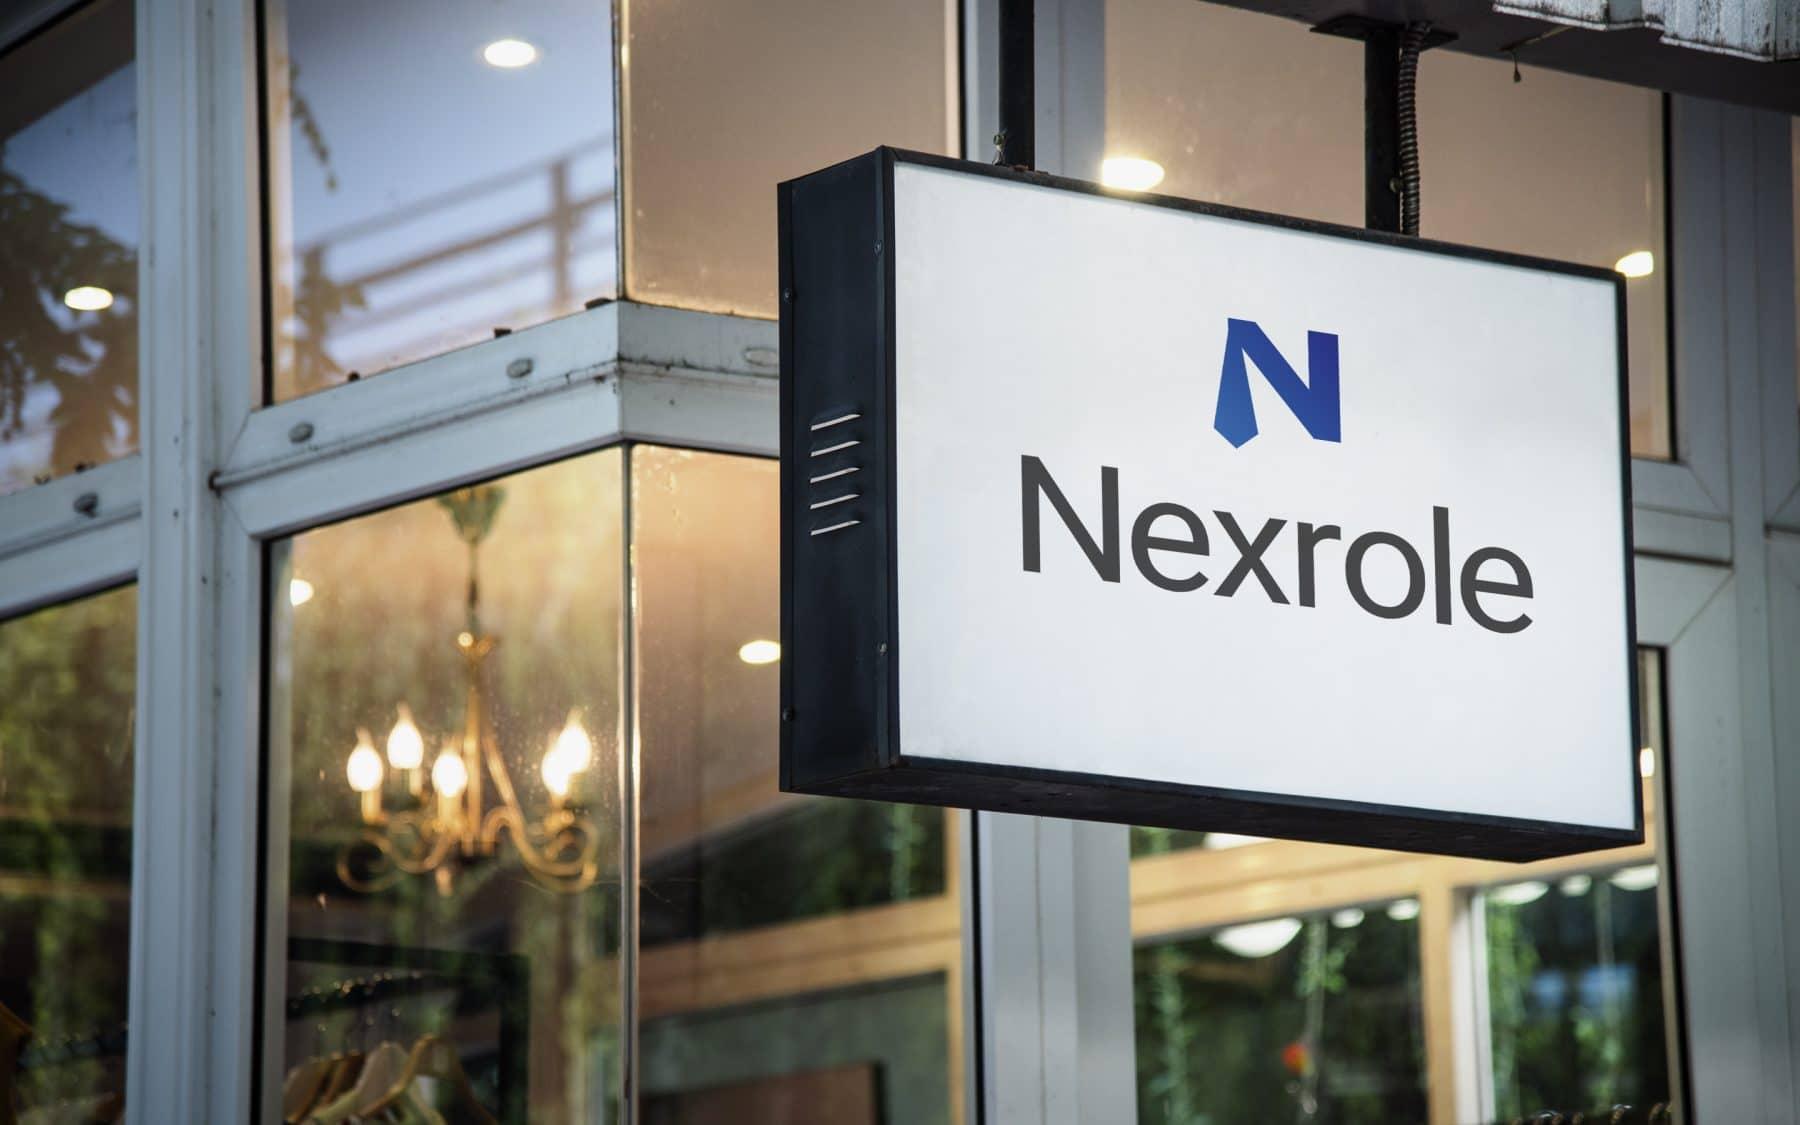 Nexrole